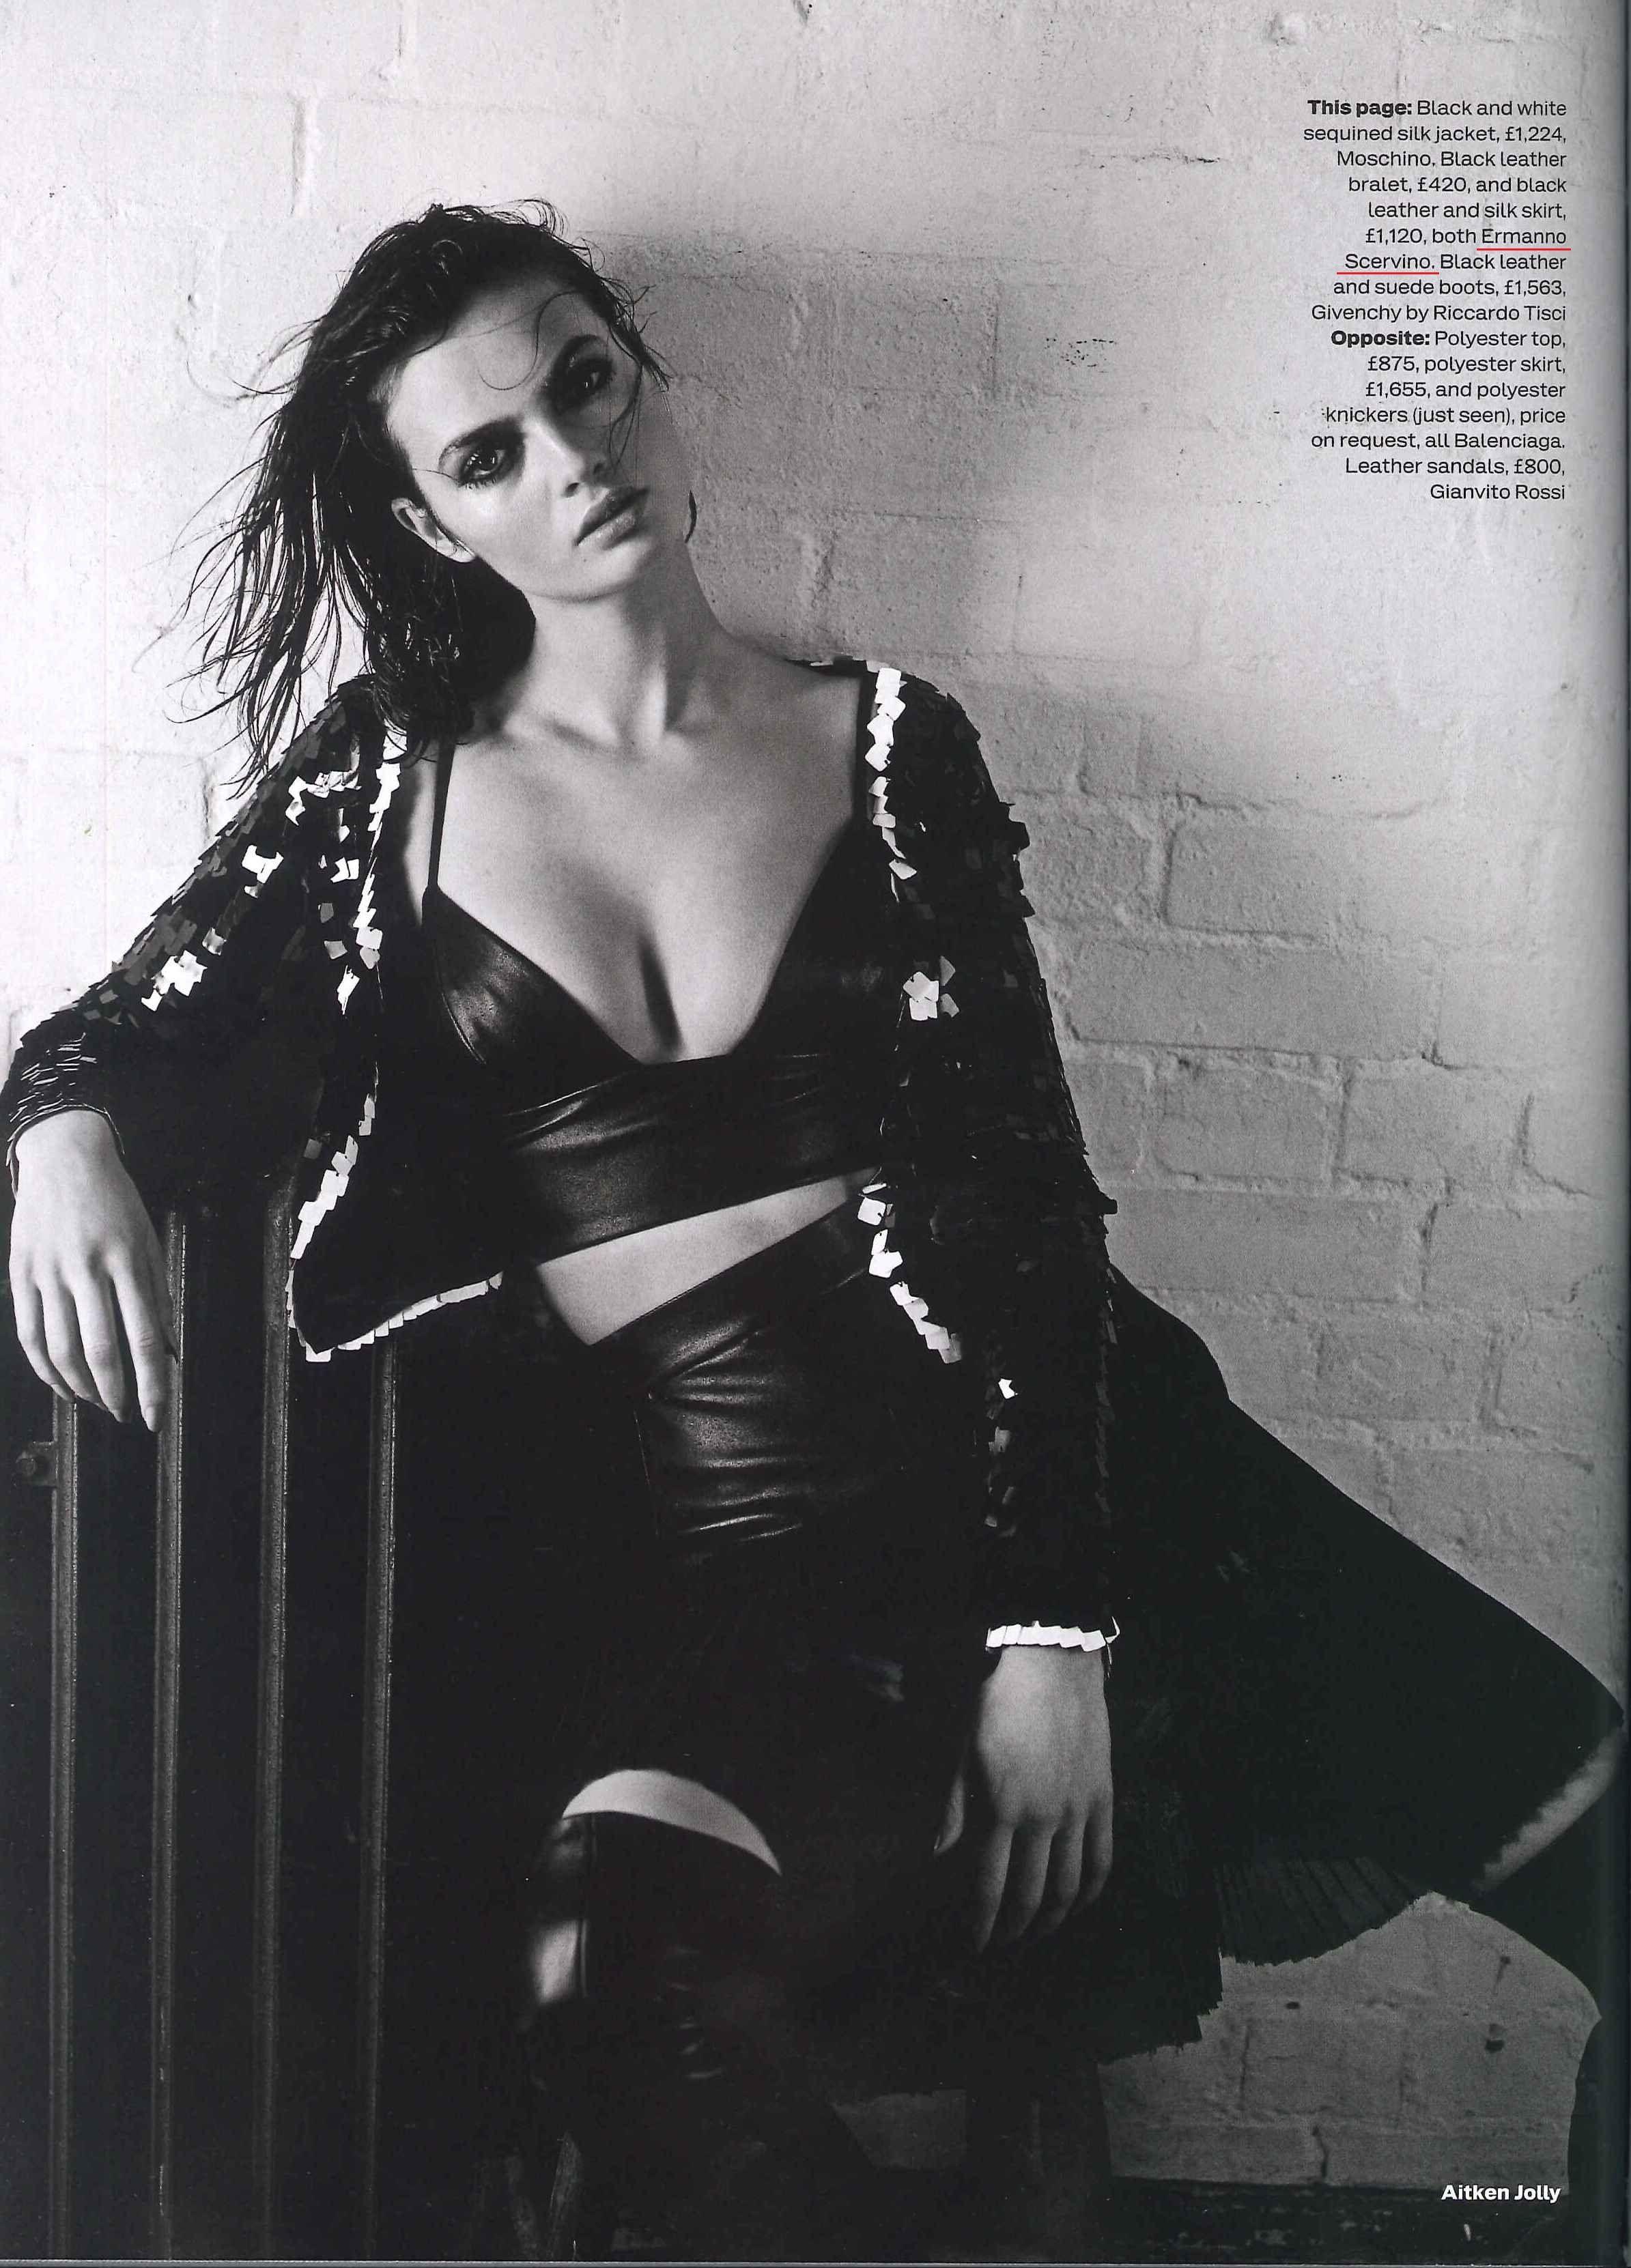 Black dress kisschasy lyrics - Ermanno Scervino Black Leather Dress